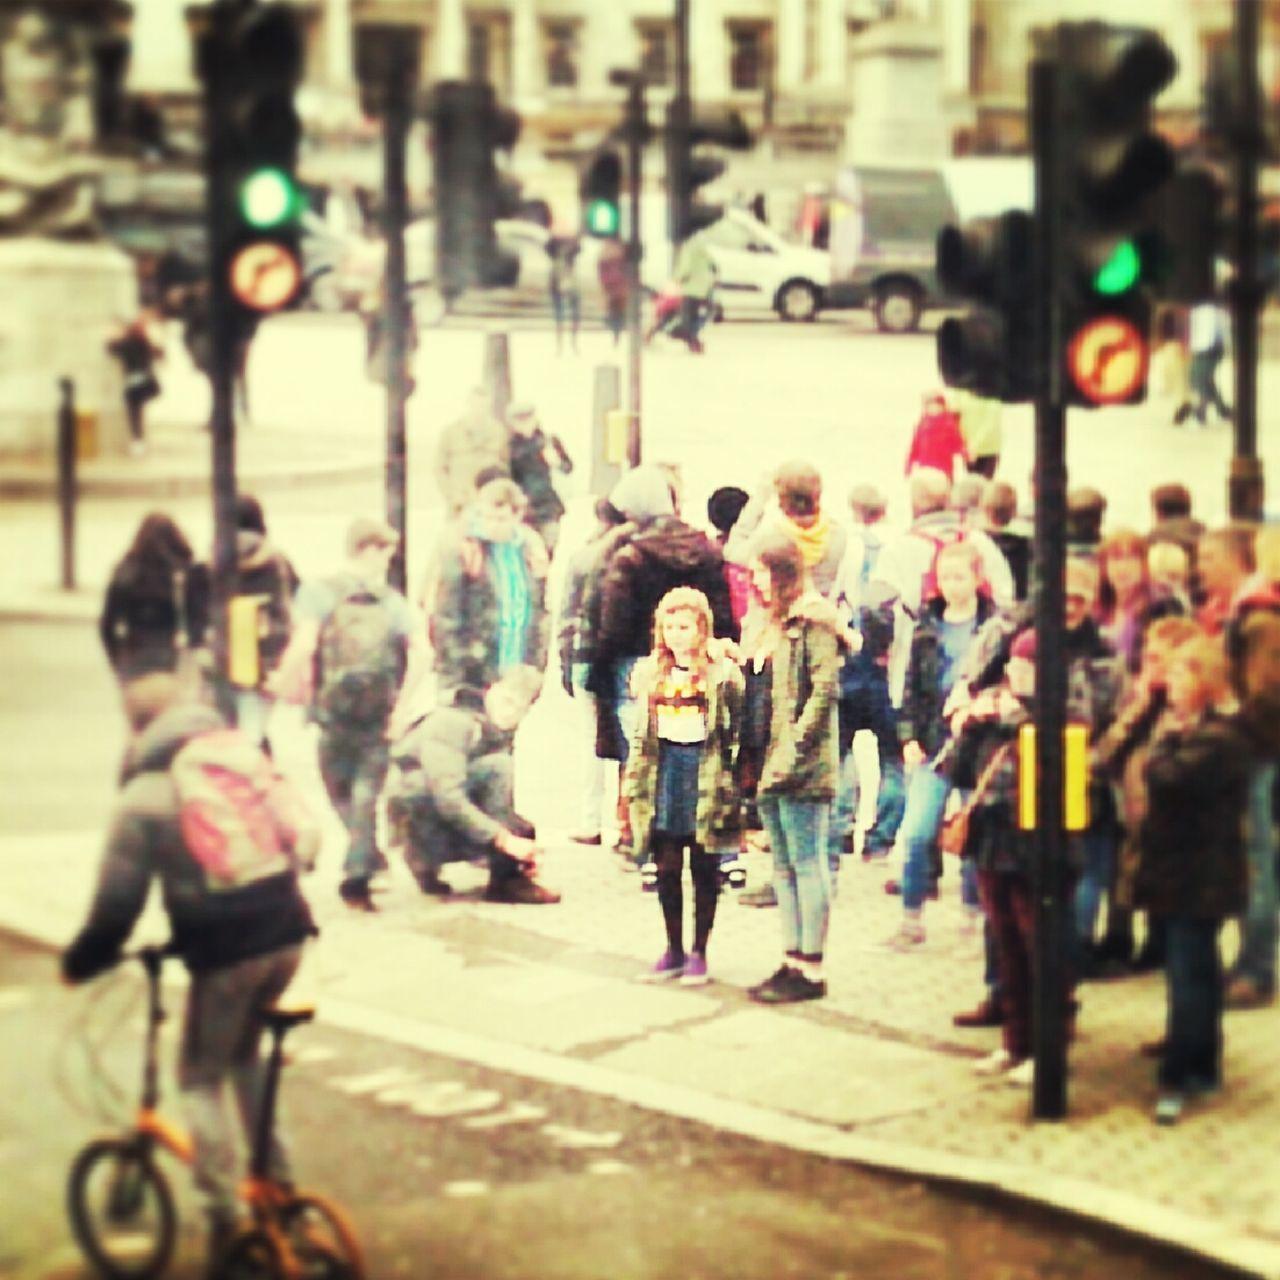 Group Of People On City Sidewalk